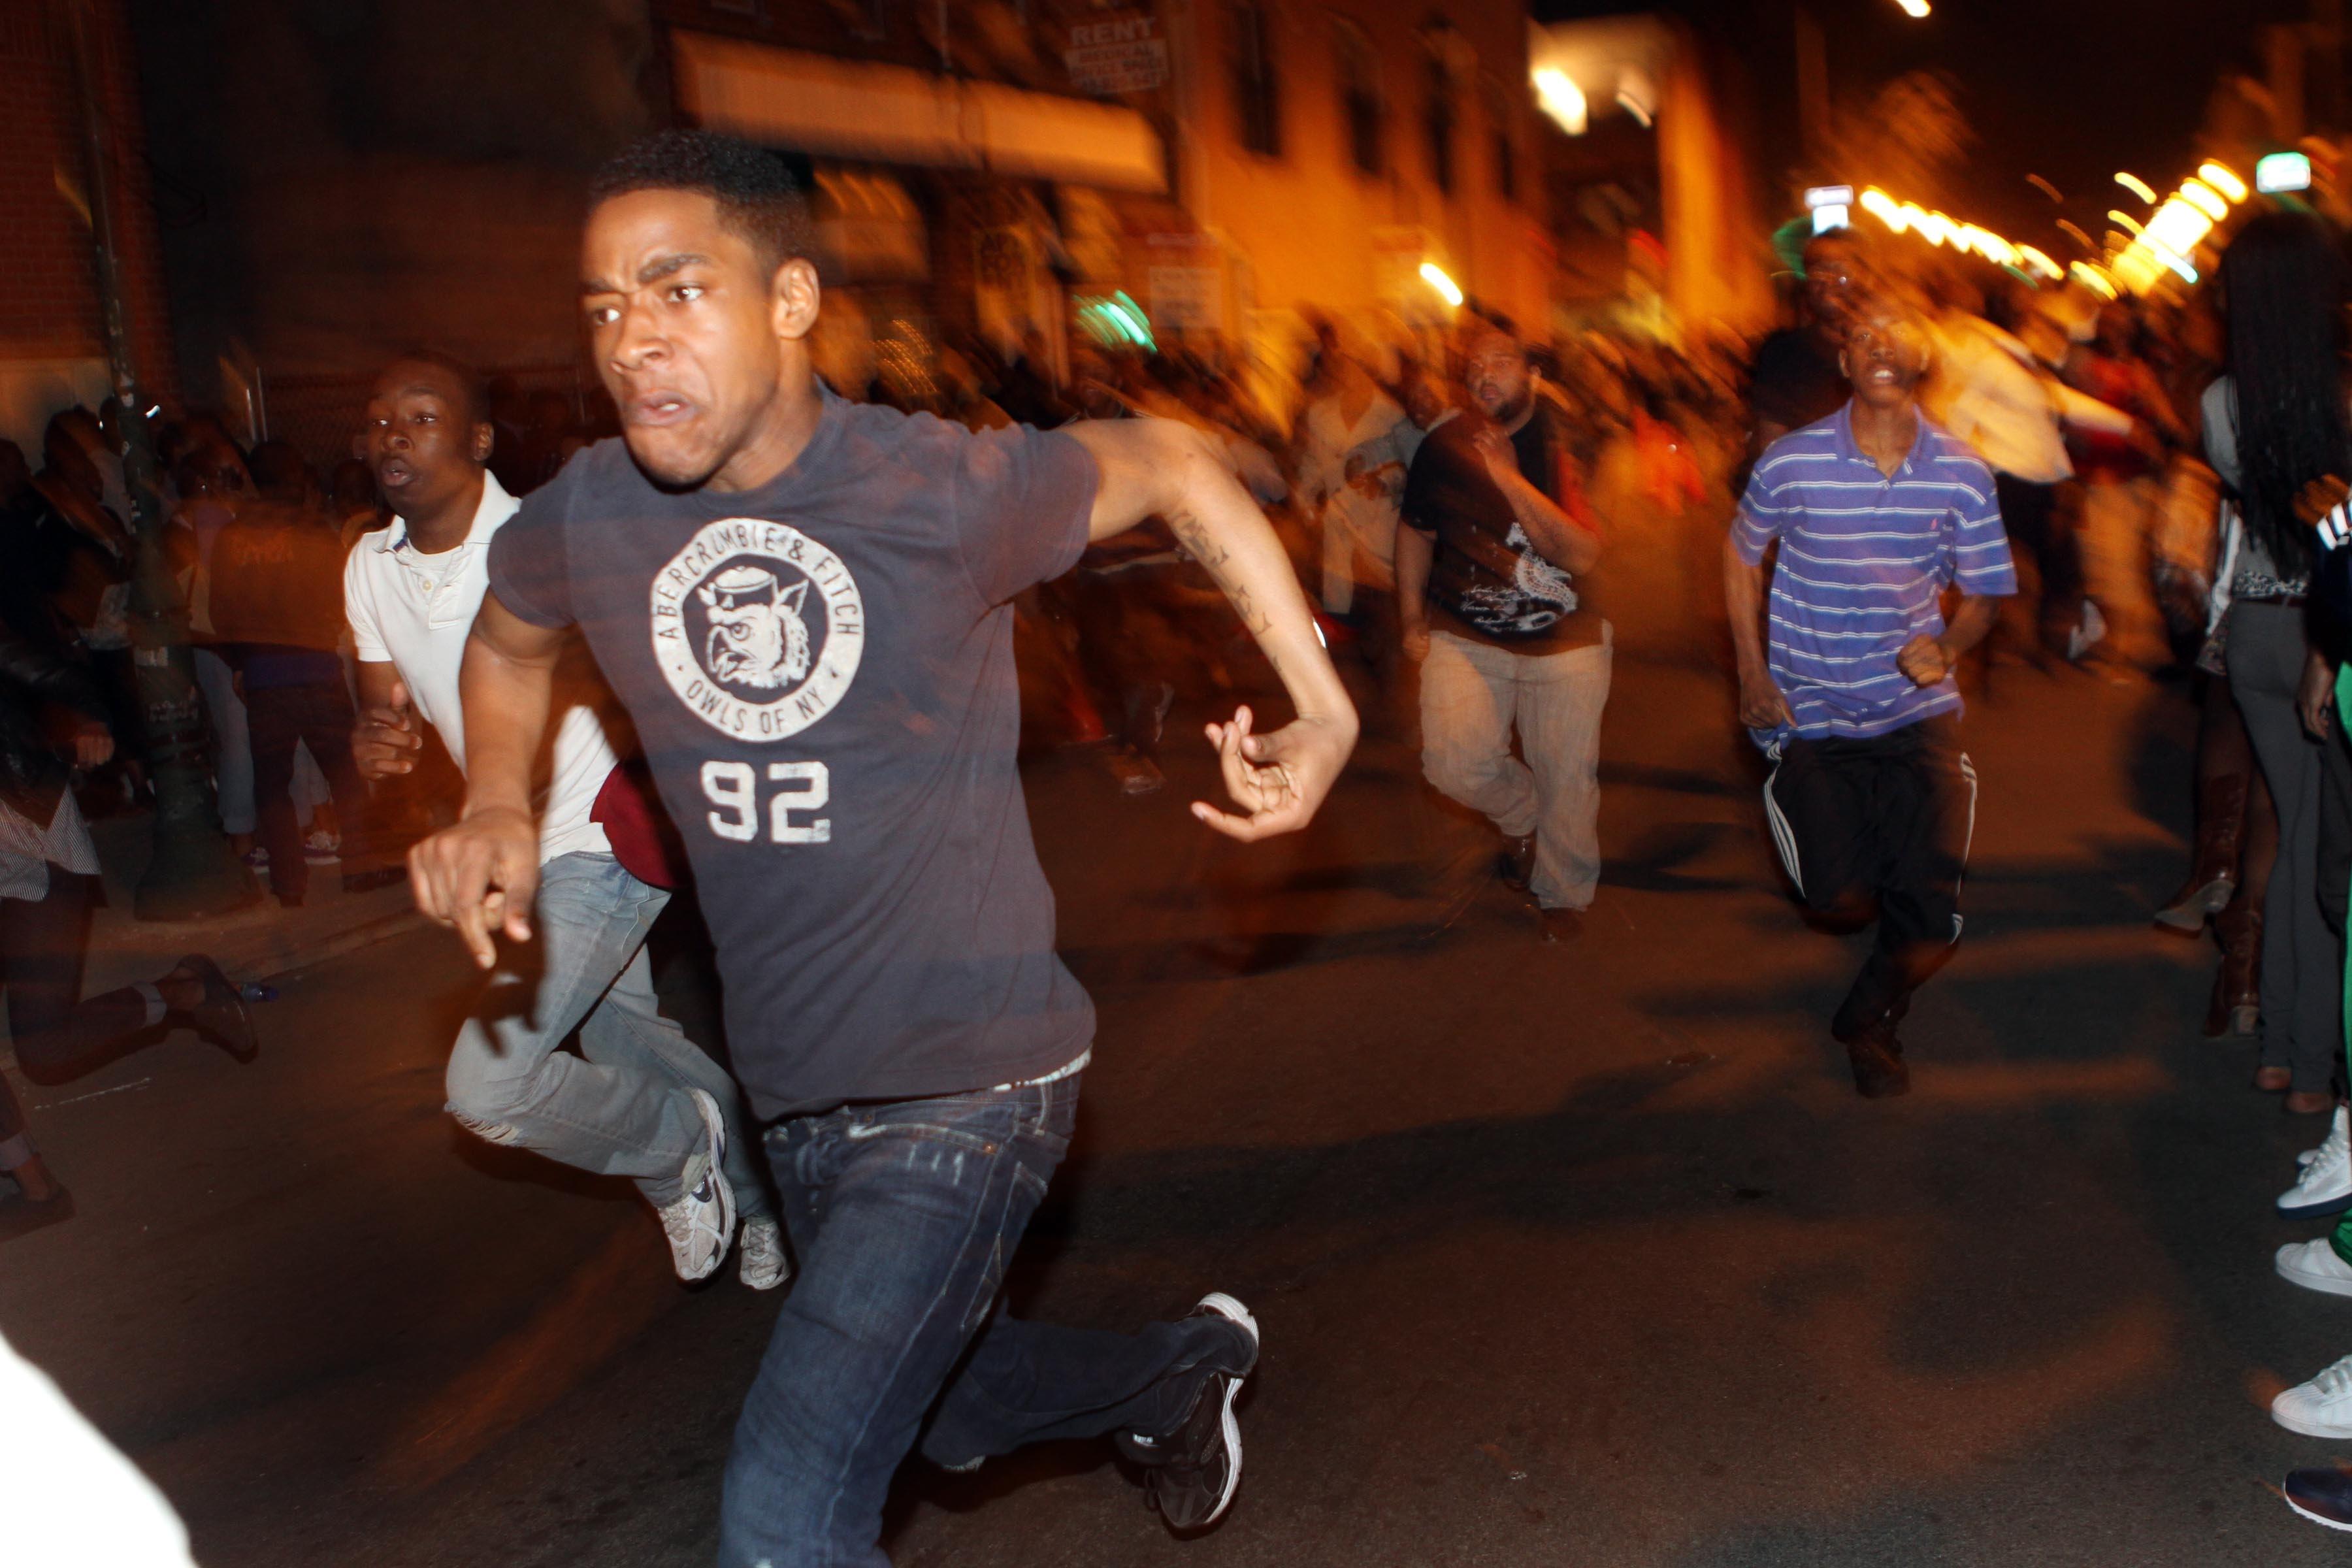 A Mo Bb Philadelphia Mayor Talks Tough To Black Teenagers After Flash